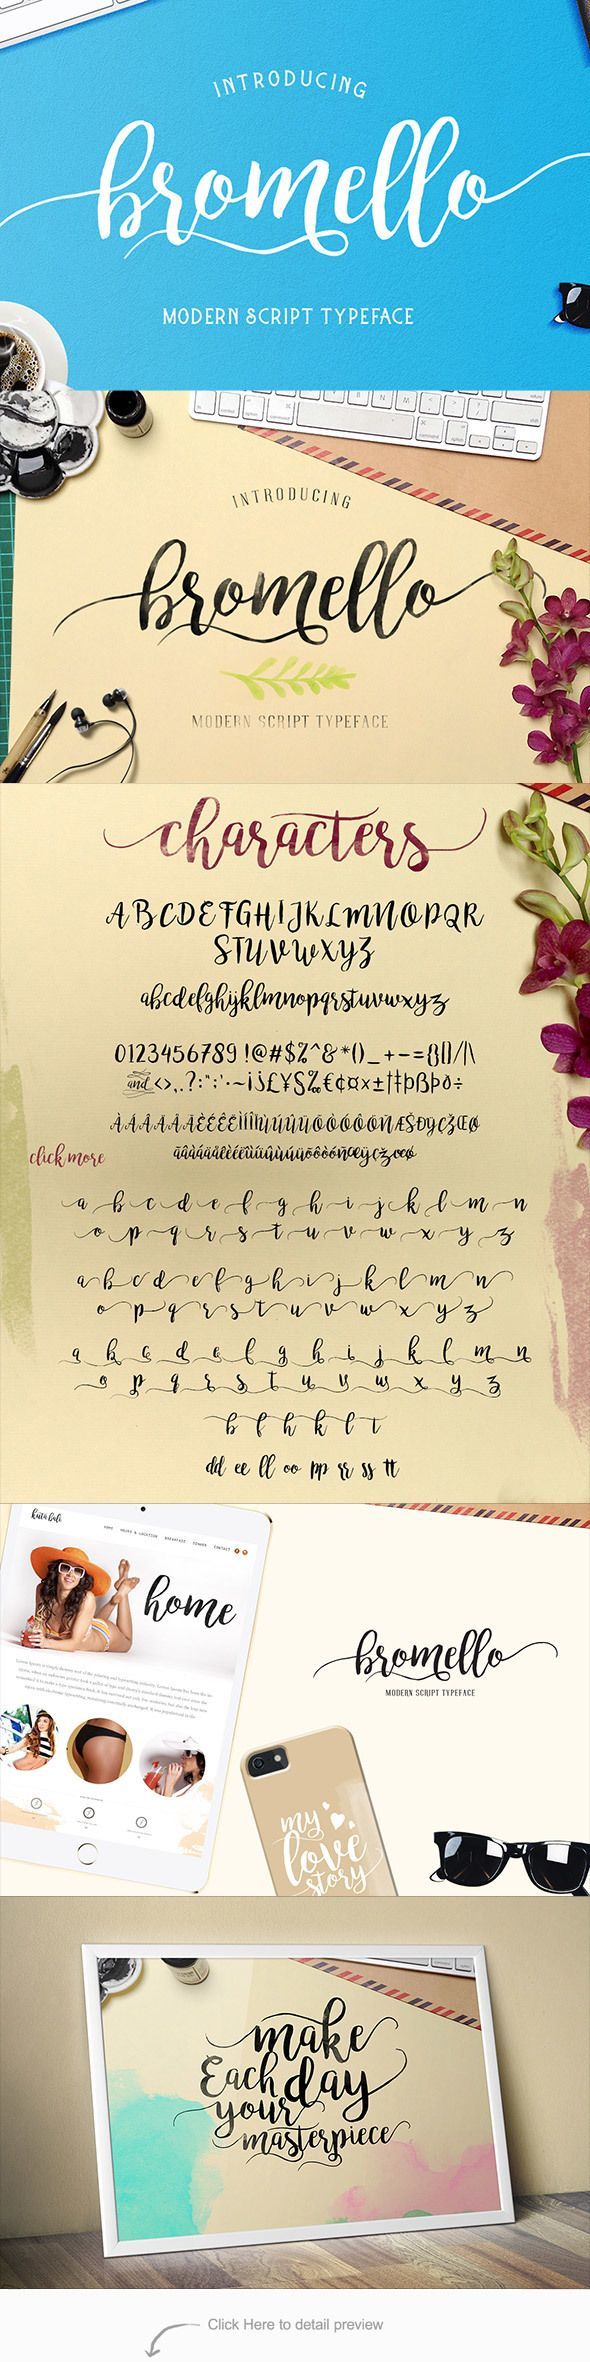 Bromello Typeface - Download: http://graphicriver.net/item/bromello-typeface/14429004?ref=ksioks